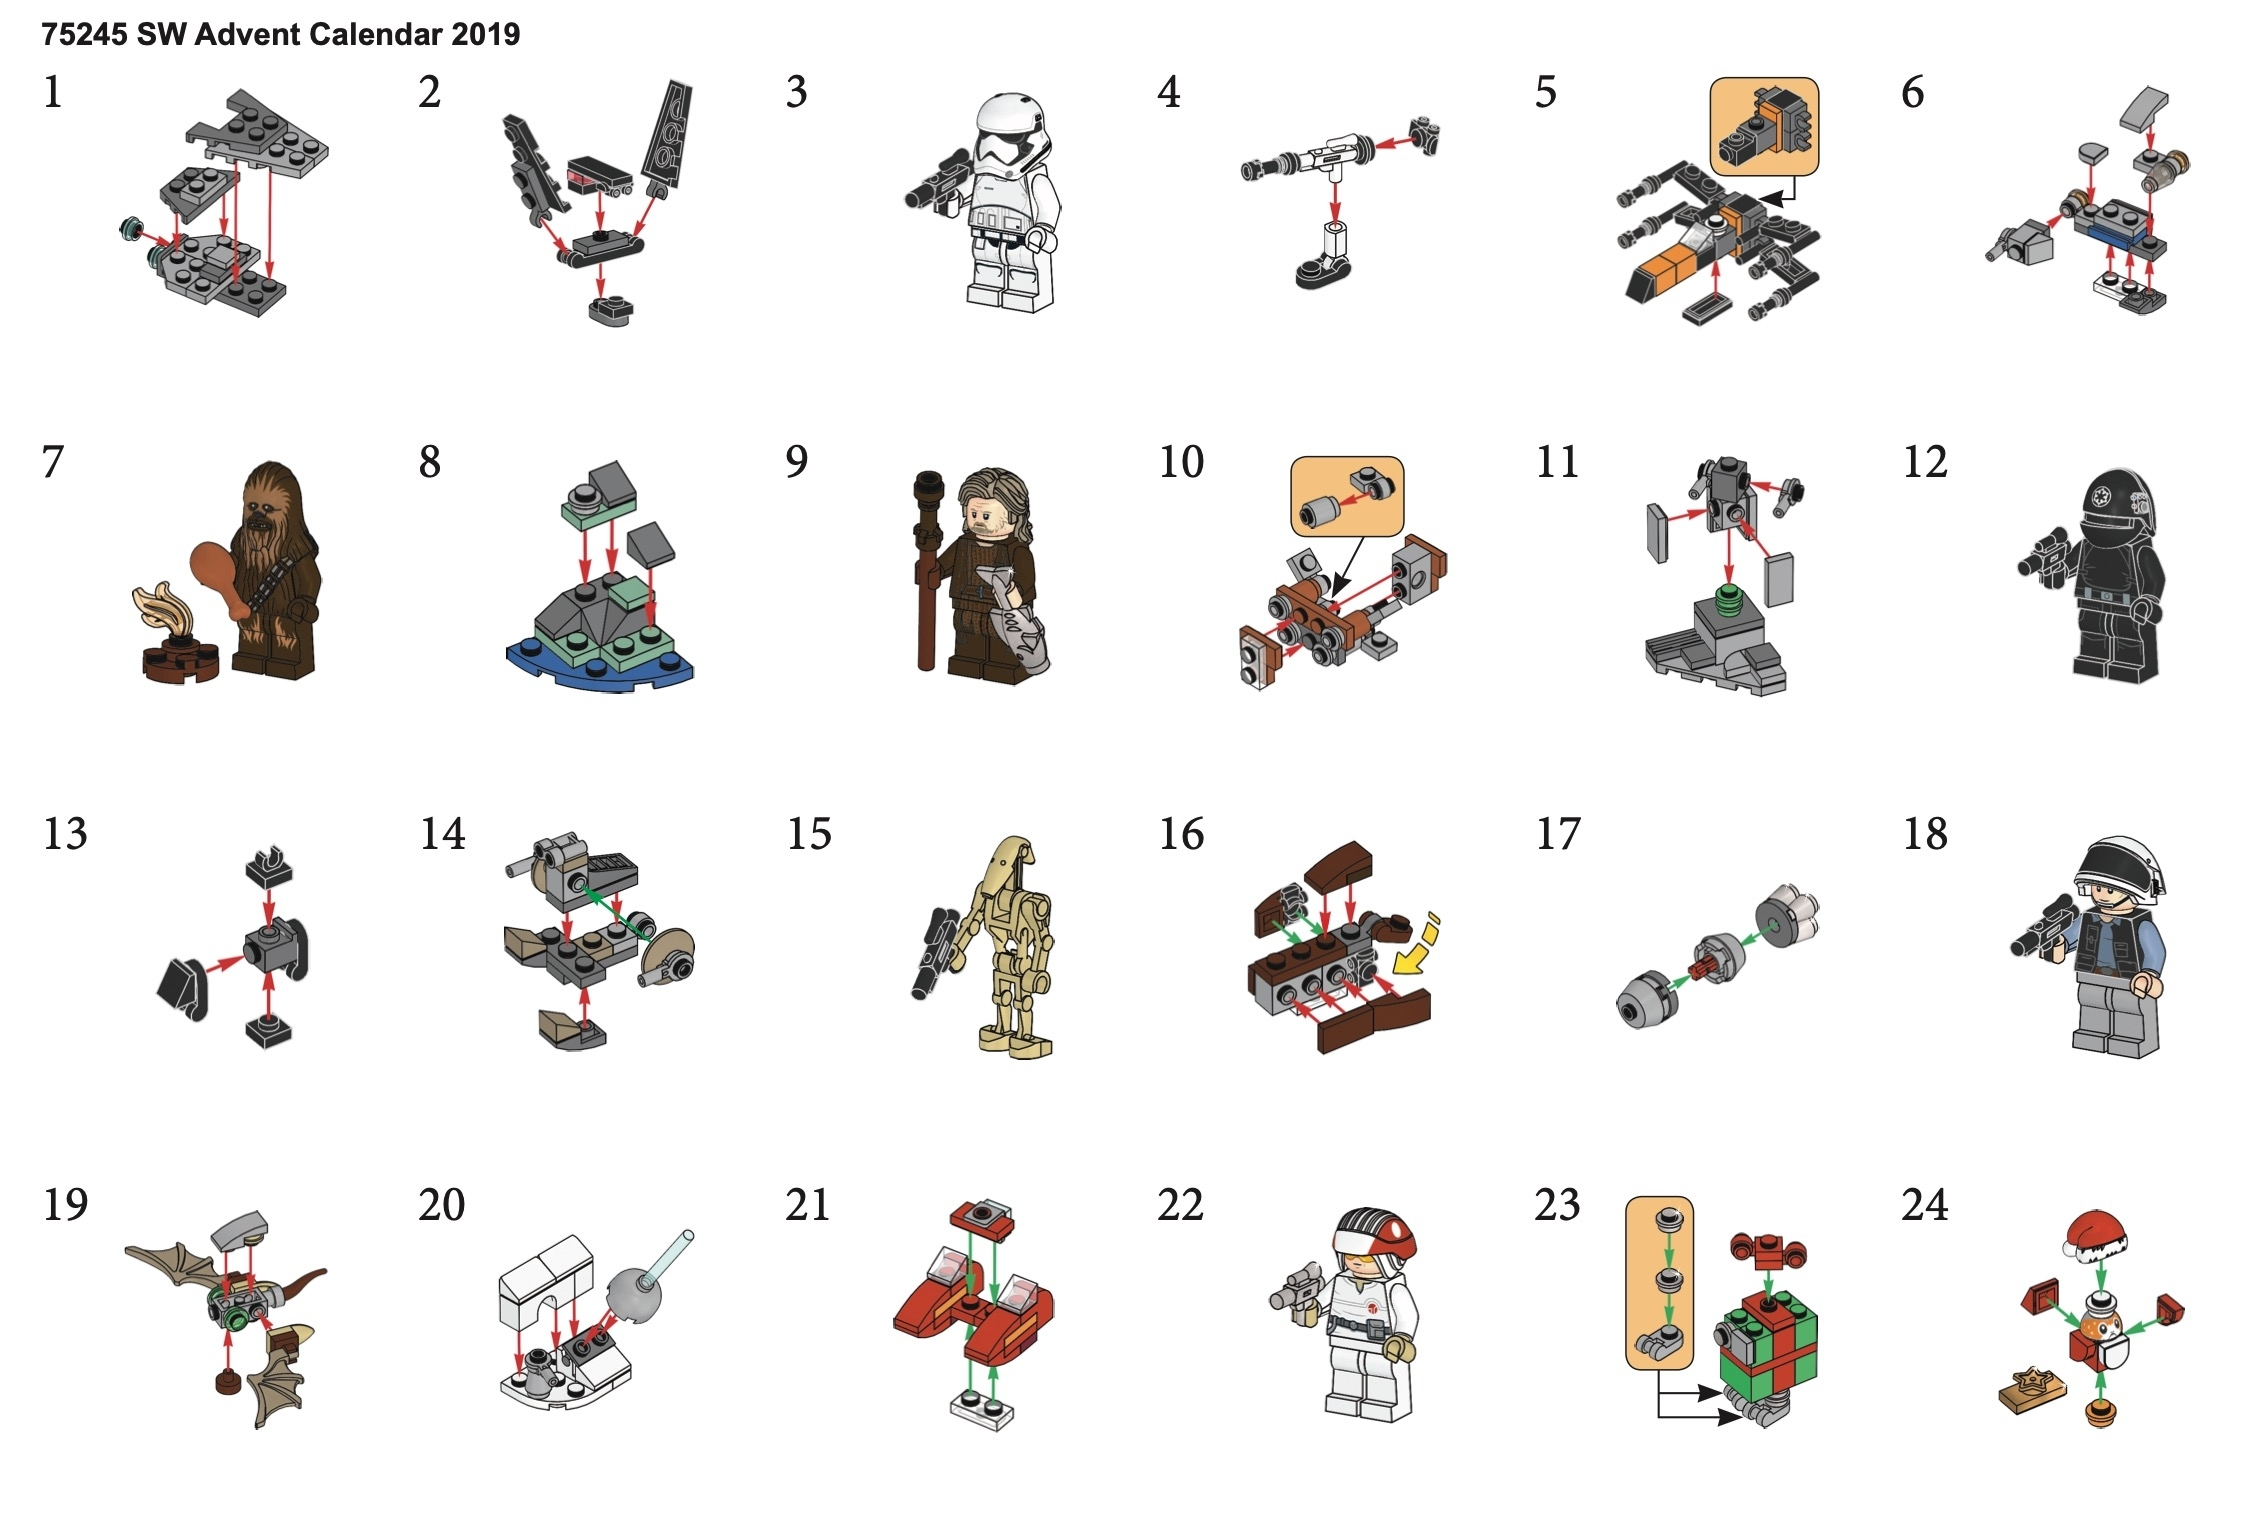 Lego 75245 Star Wars Advent Calendar Instructions, Star Wars in Are There Instructions For The Lego Star Wars Advent Calendar